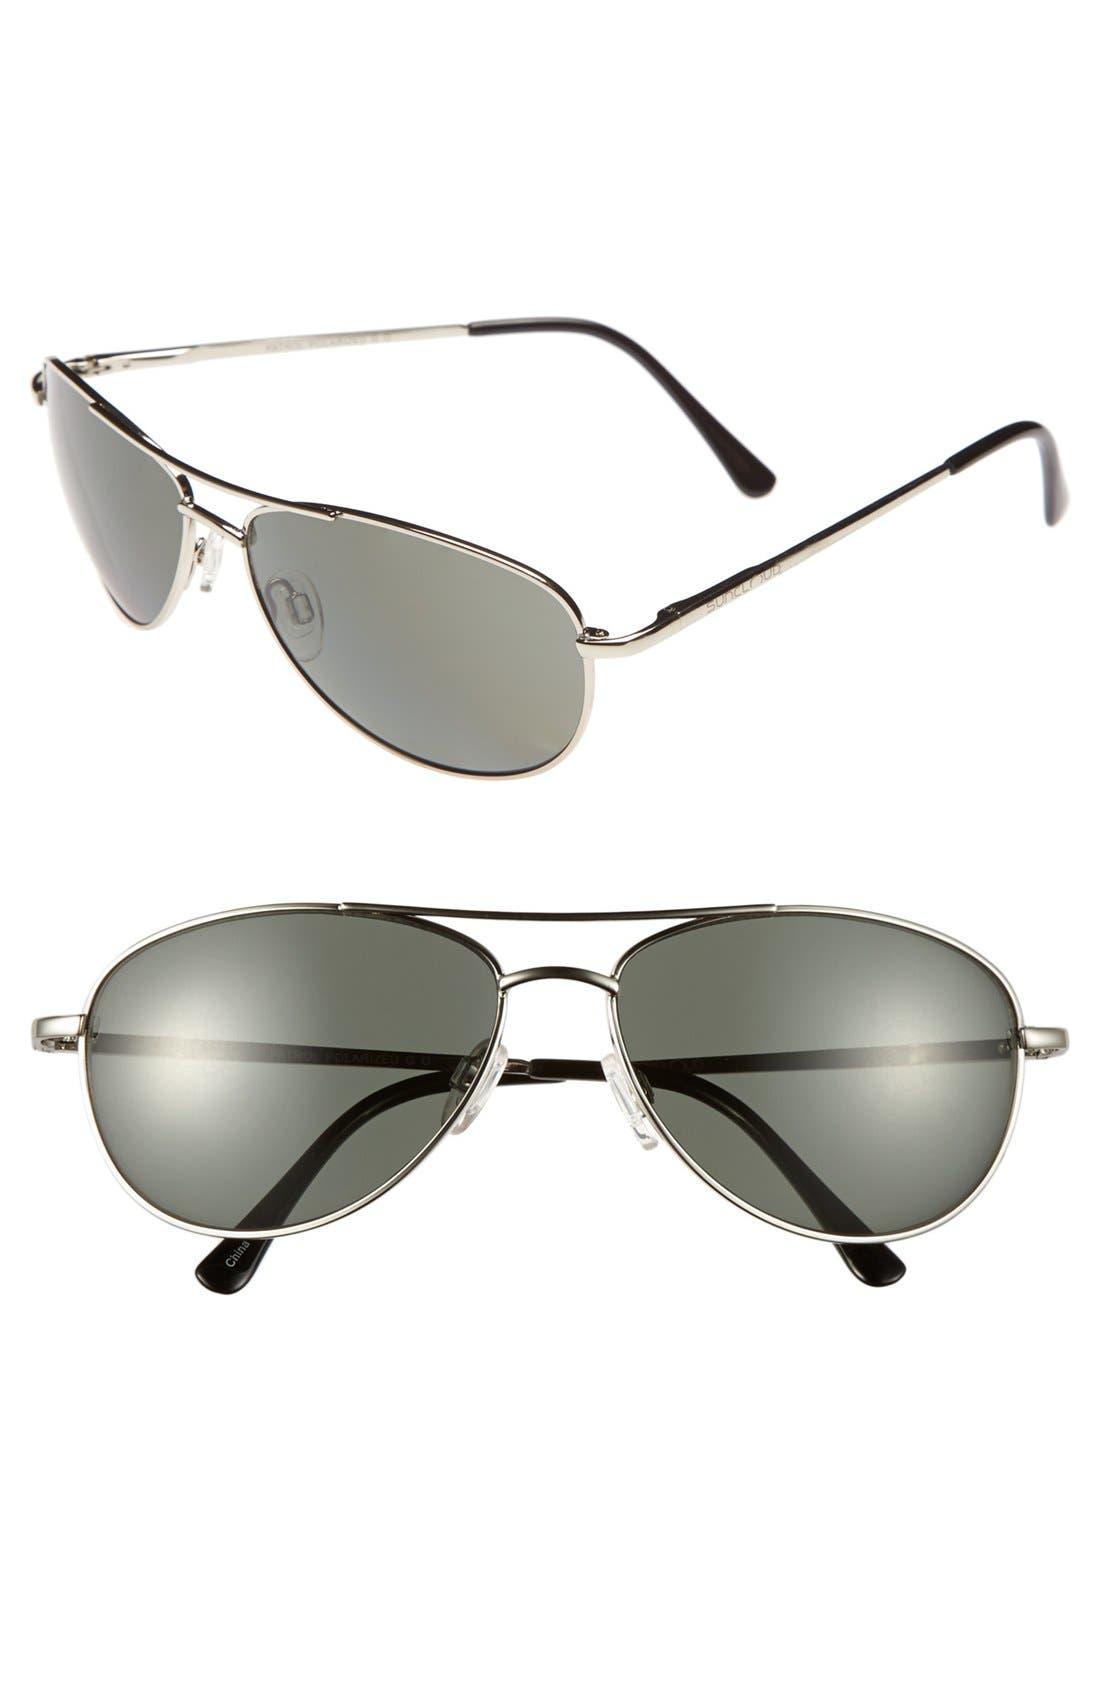 Main Image - Suncloud 'Patrol' Polarized Sunglasses